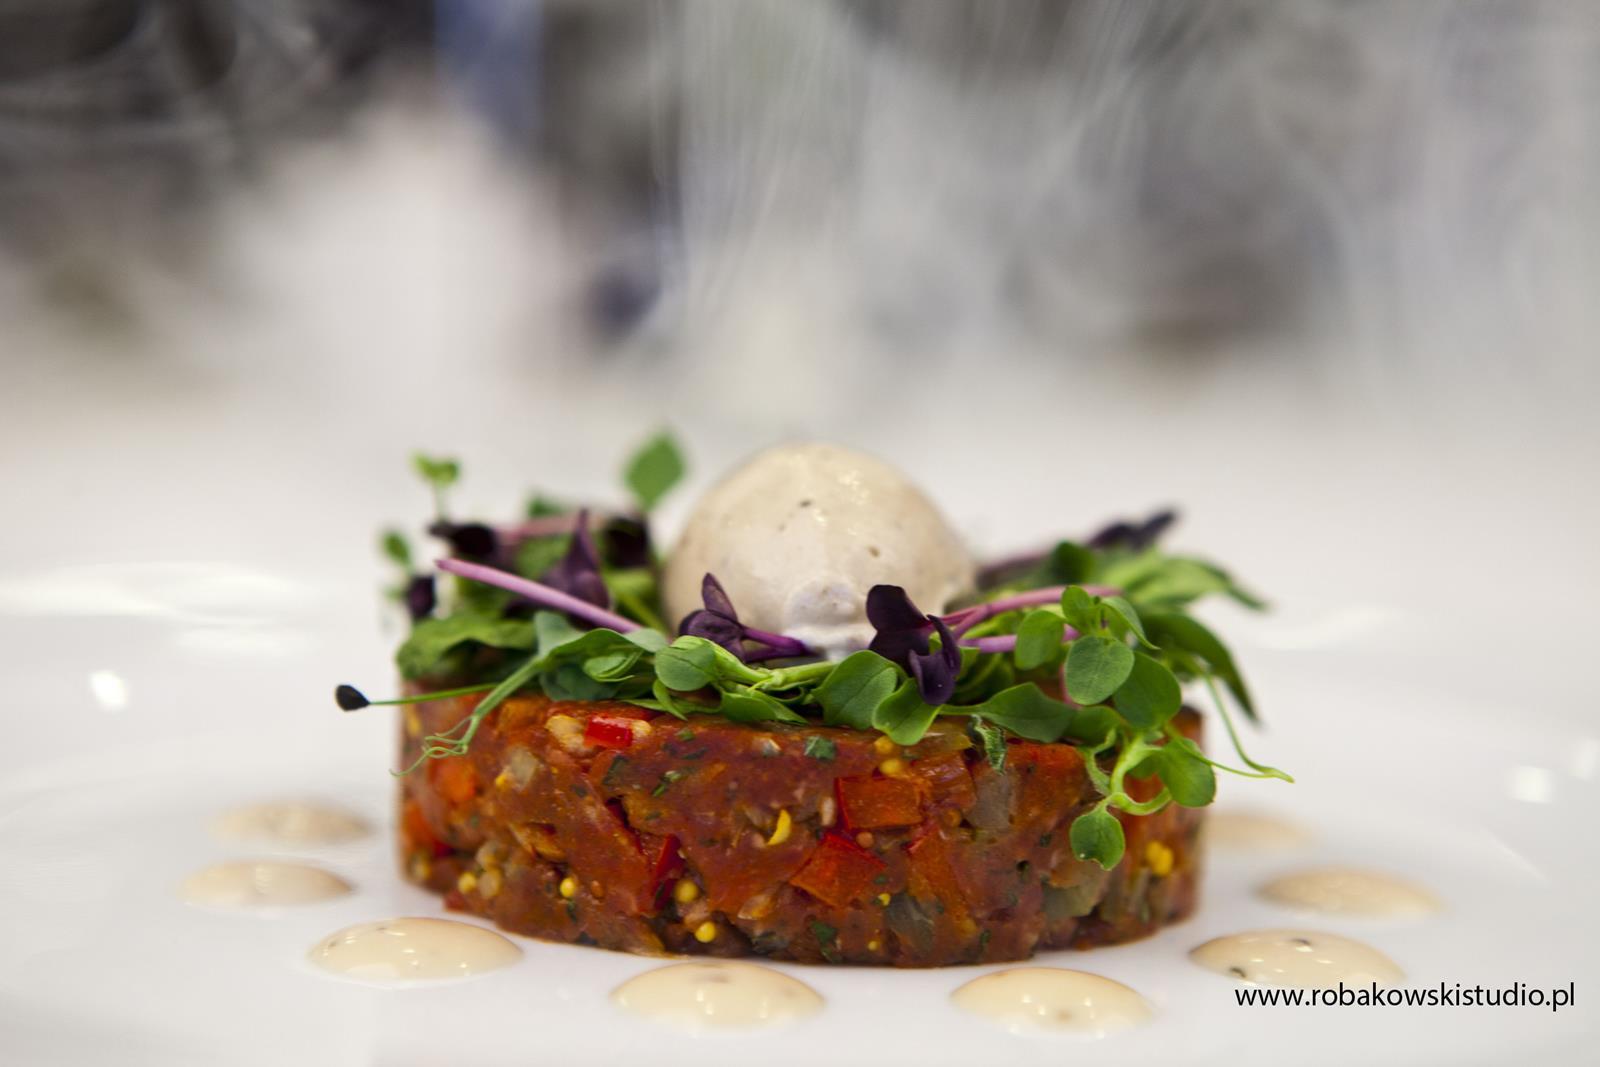 Pokazy Kuchni Molekularnej Kreatywna Kuchnia